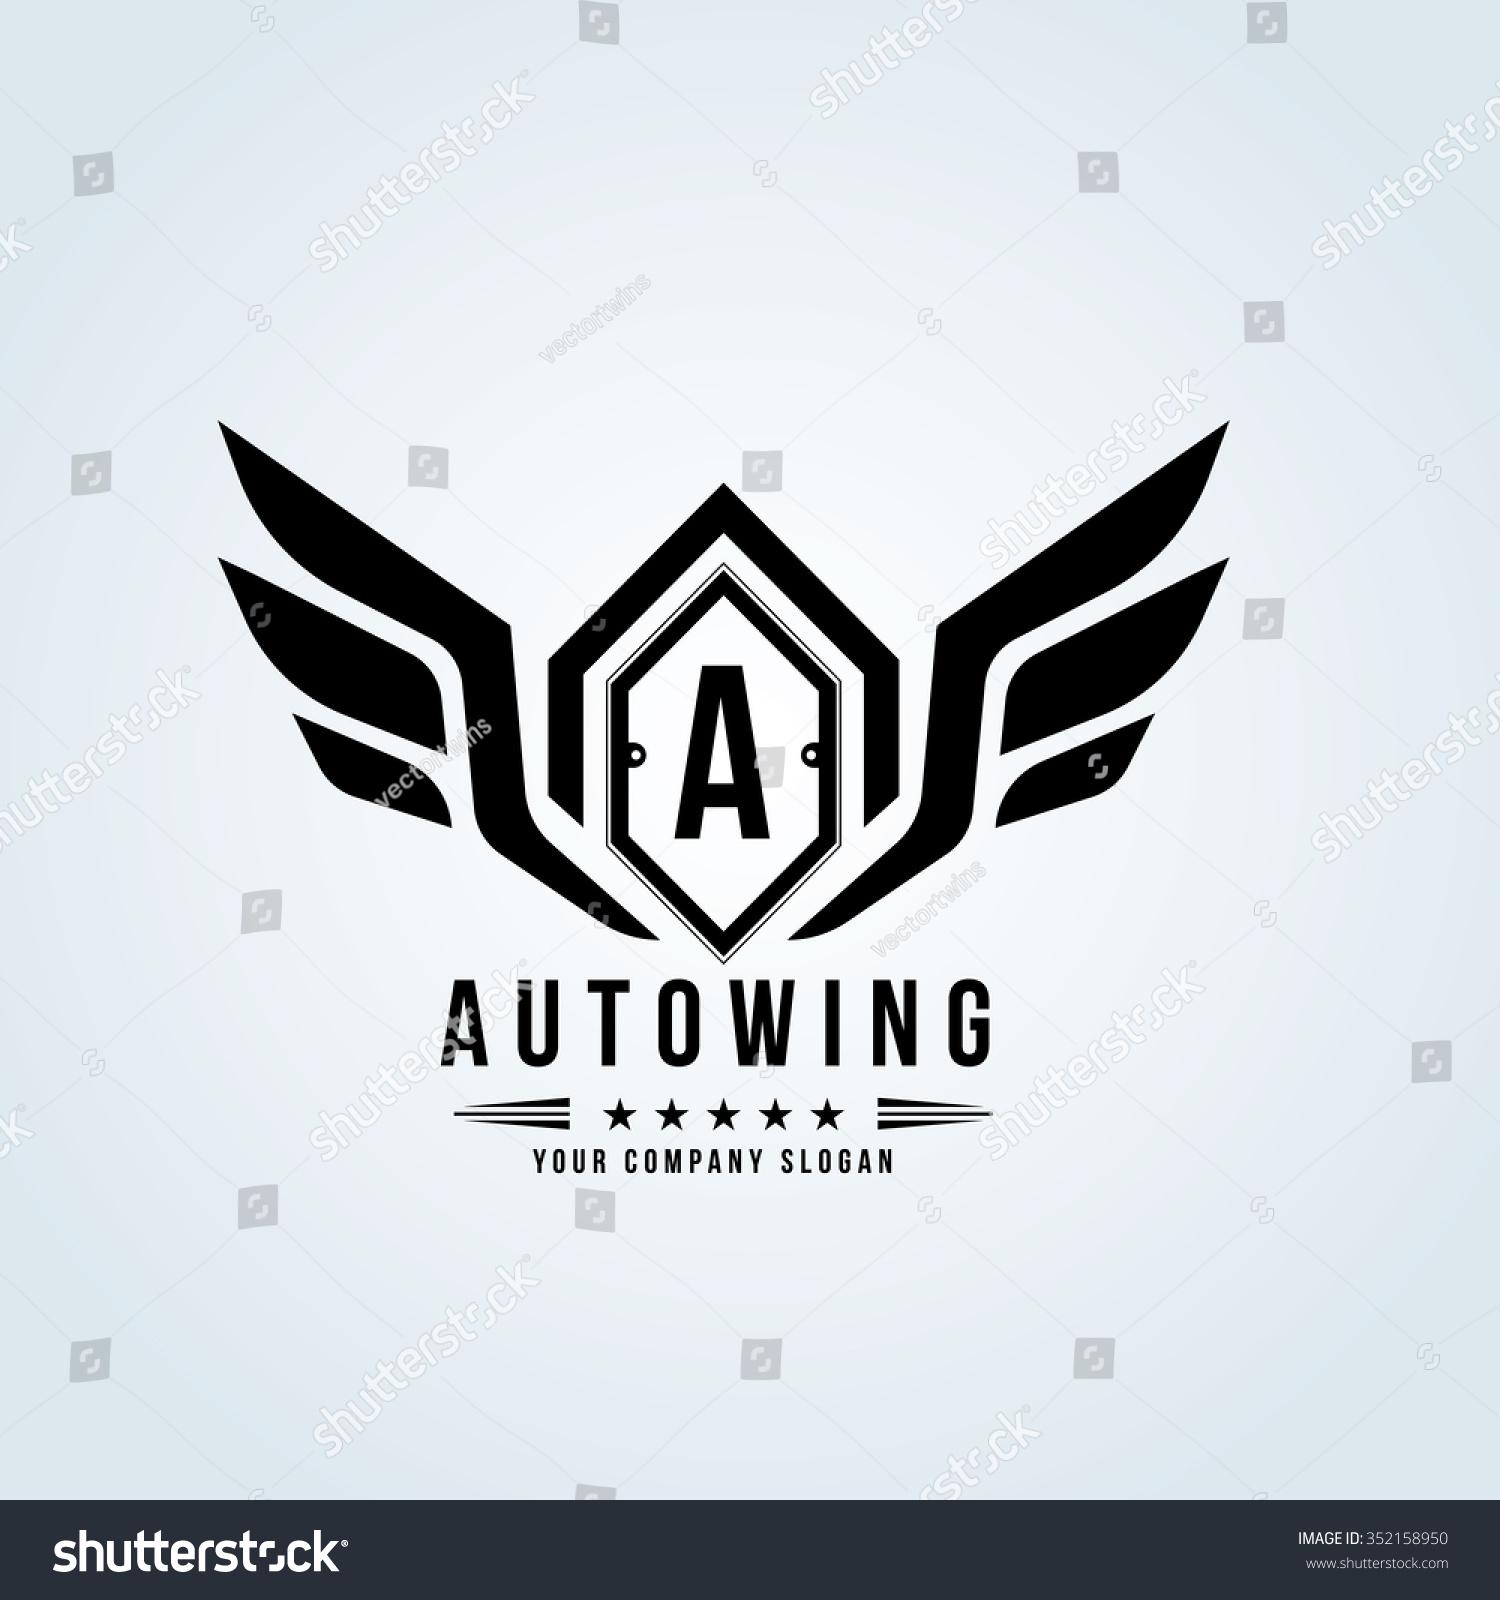 Old Car Logos Wings auto wing automotive logo crests logo vector logo